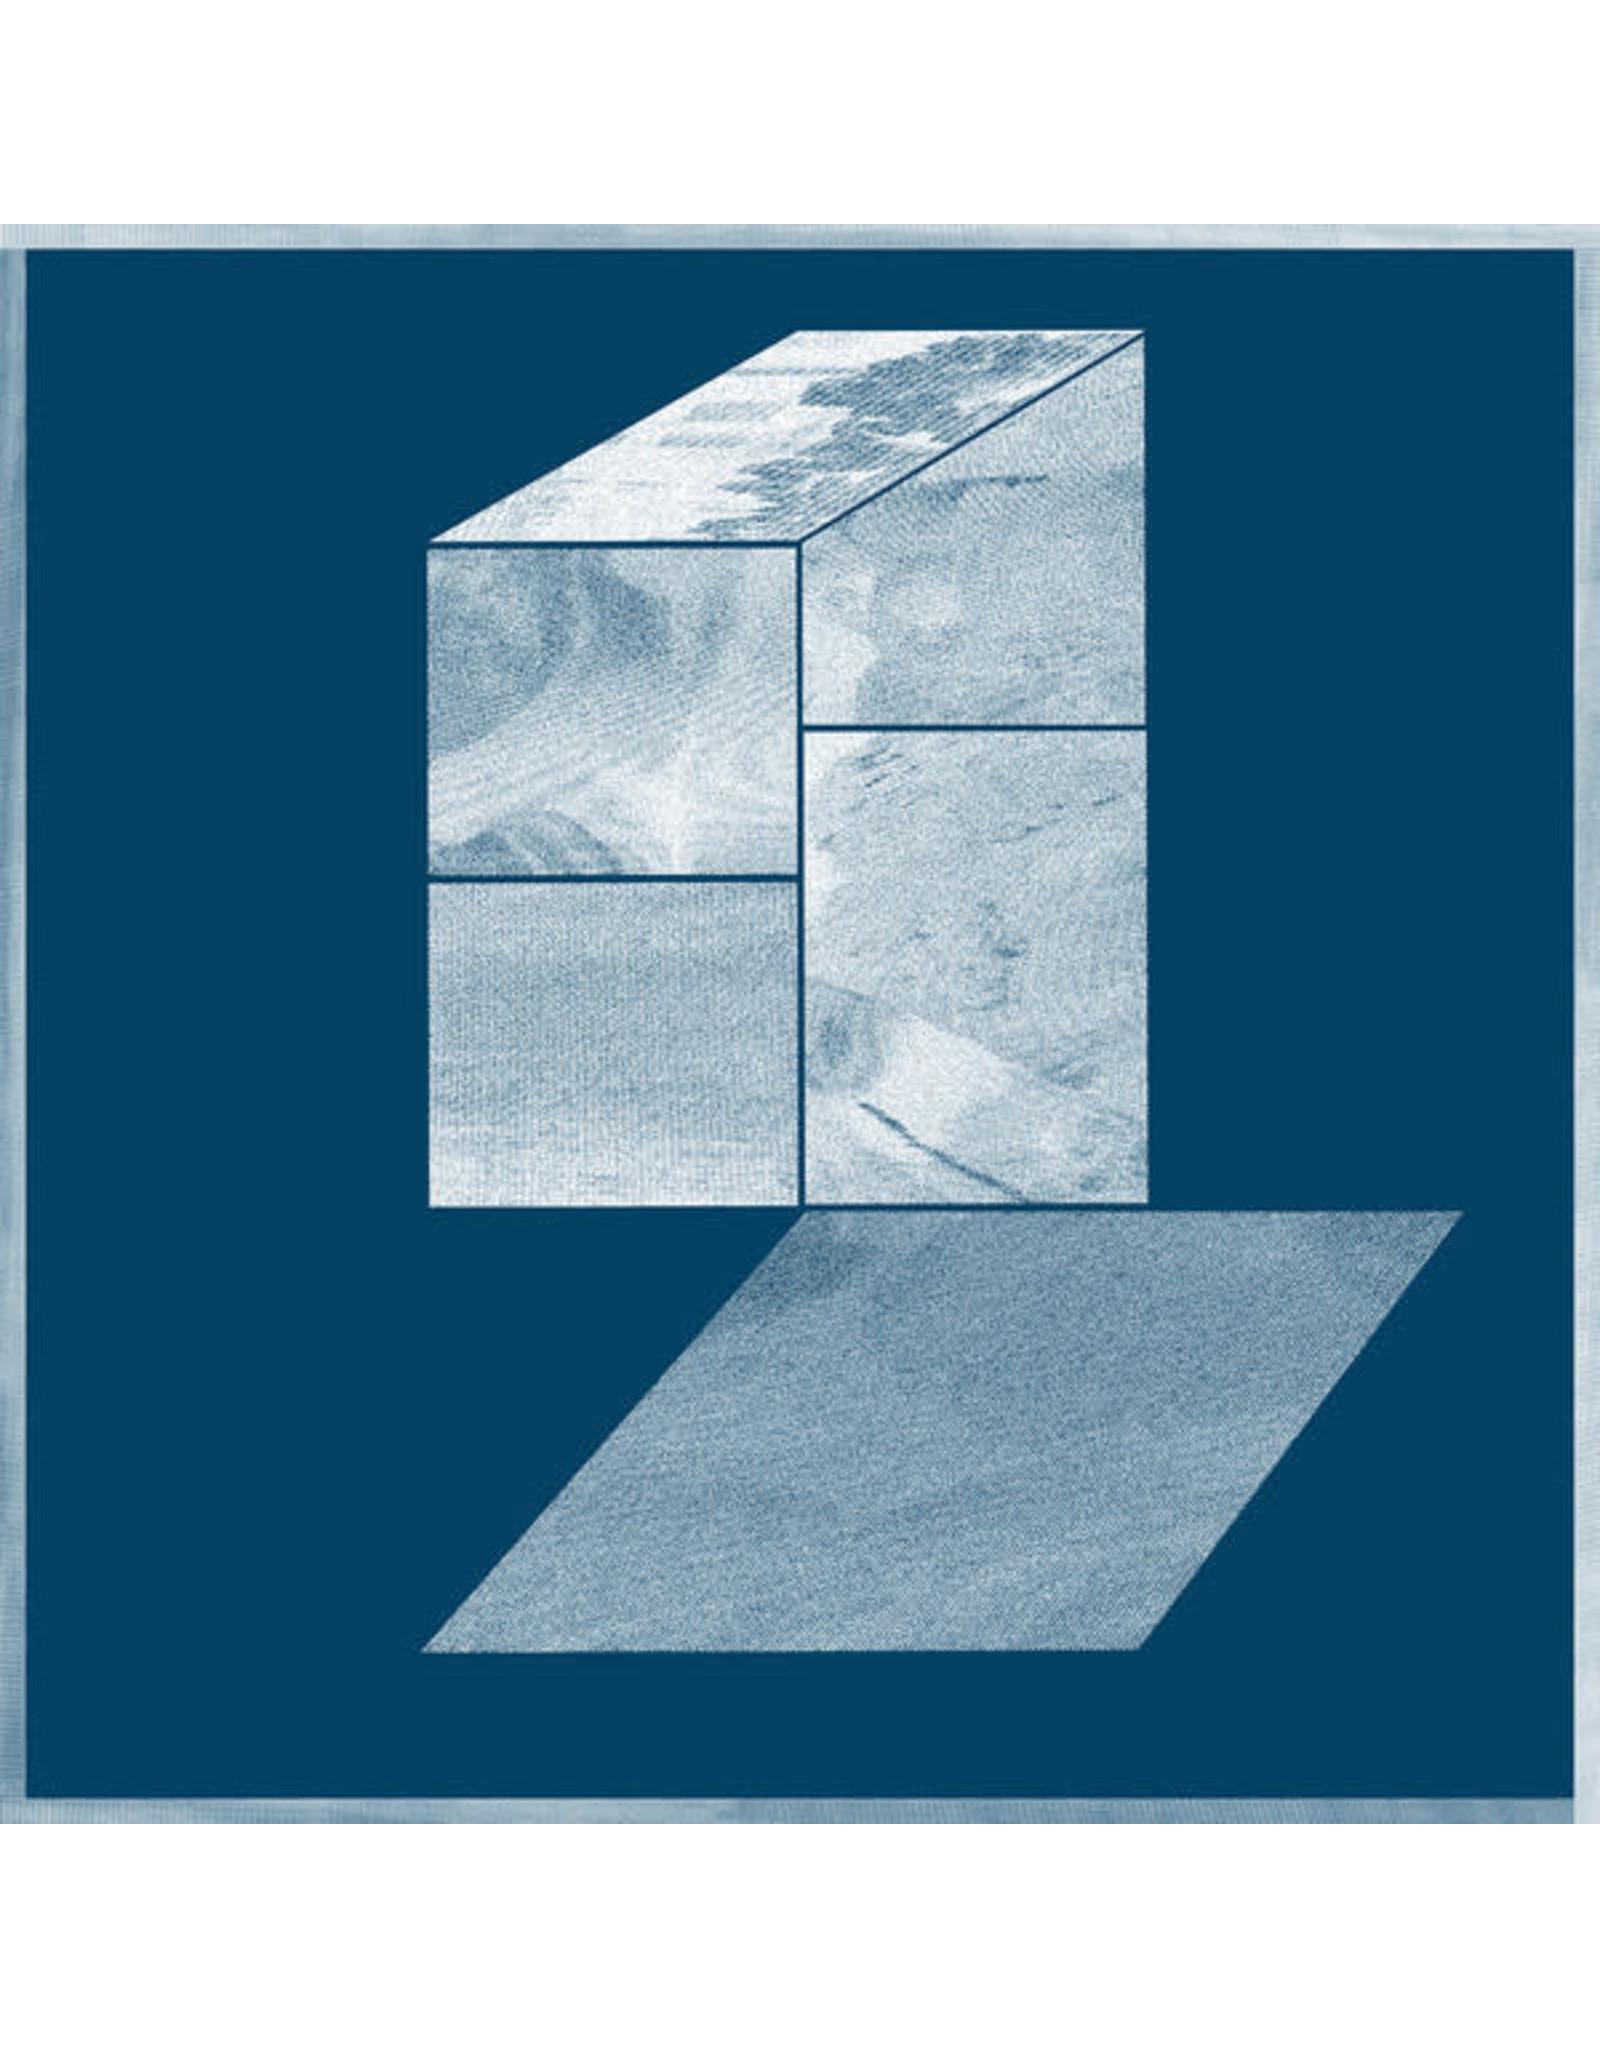 New Vinyl Booker Stardrum - Temporary, Etc. LP